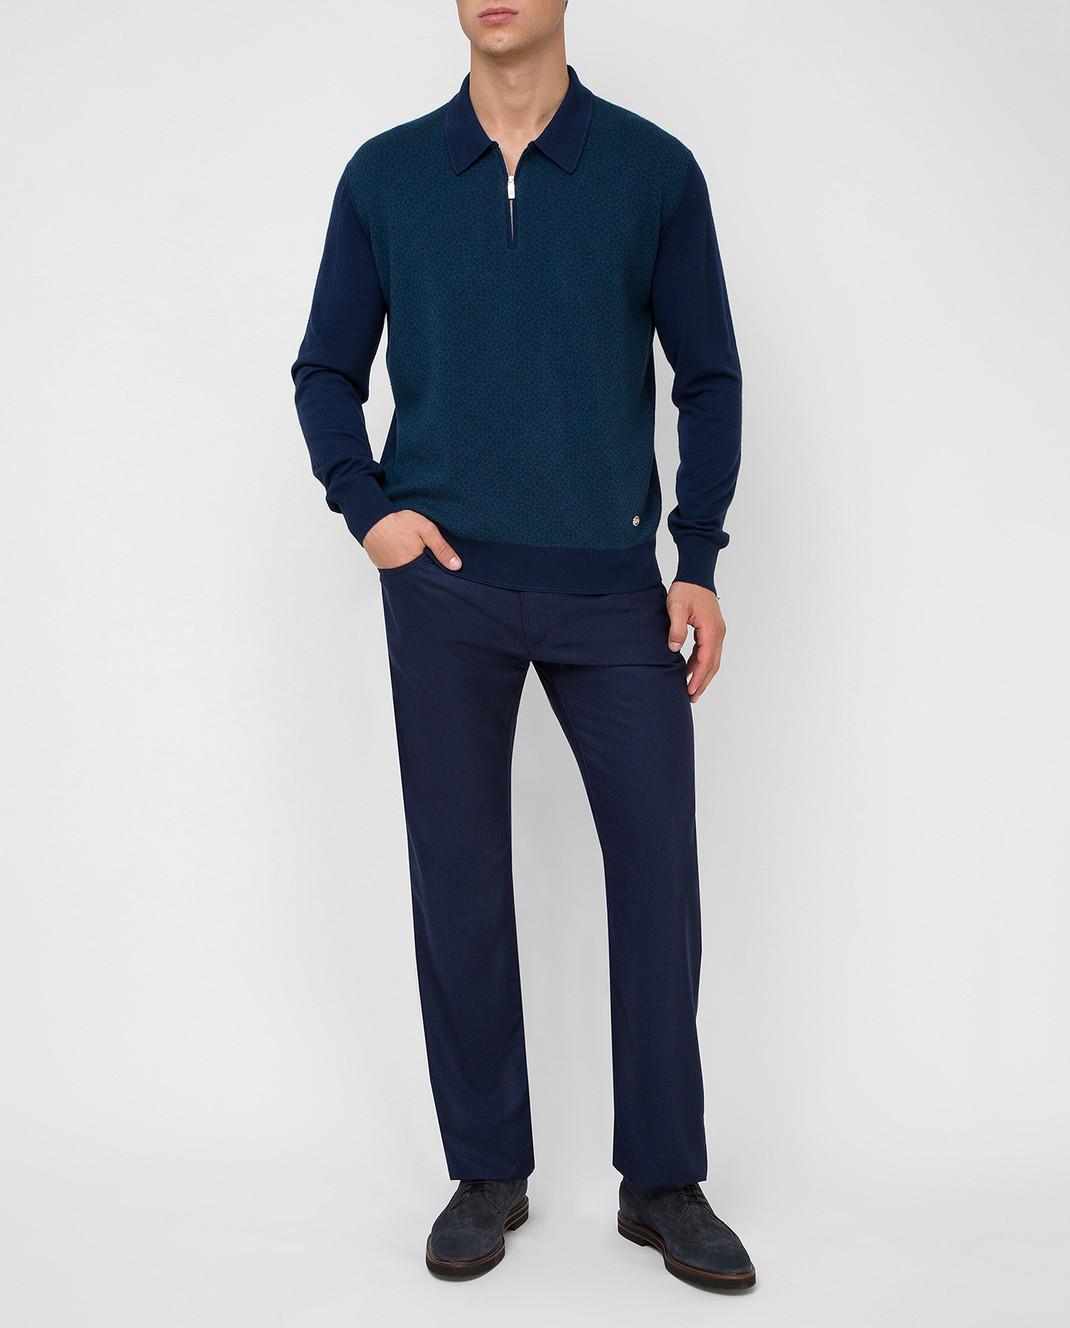 Castello d'Oro Темно-синие брюки из шерсти изображение 2